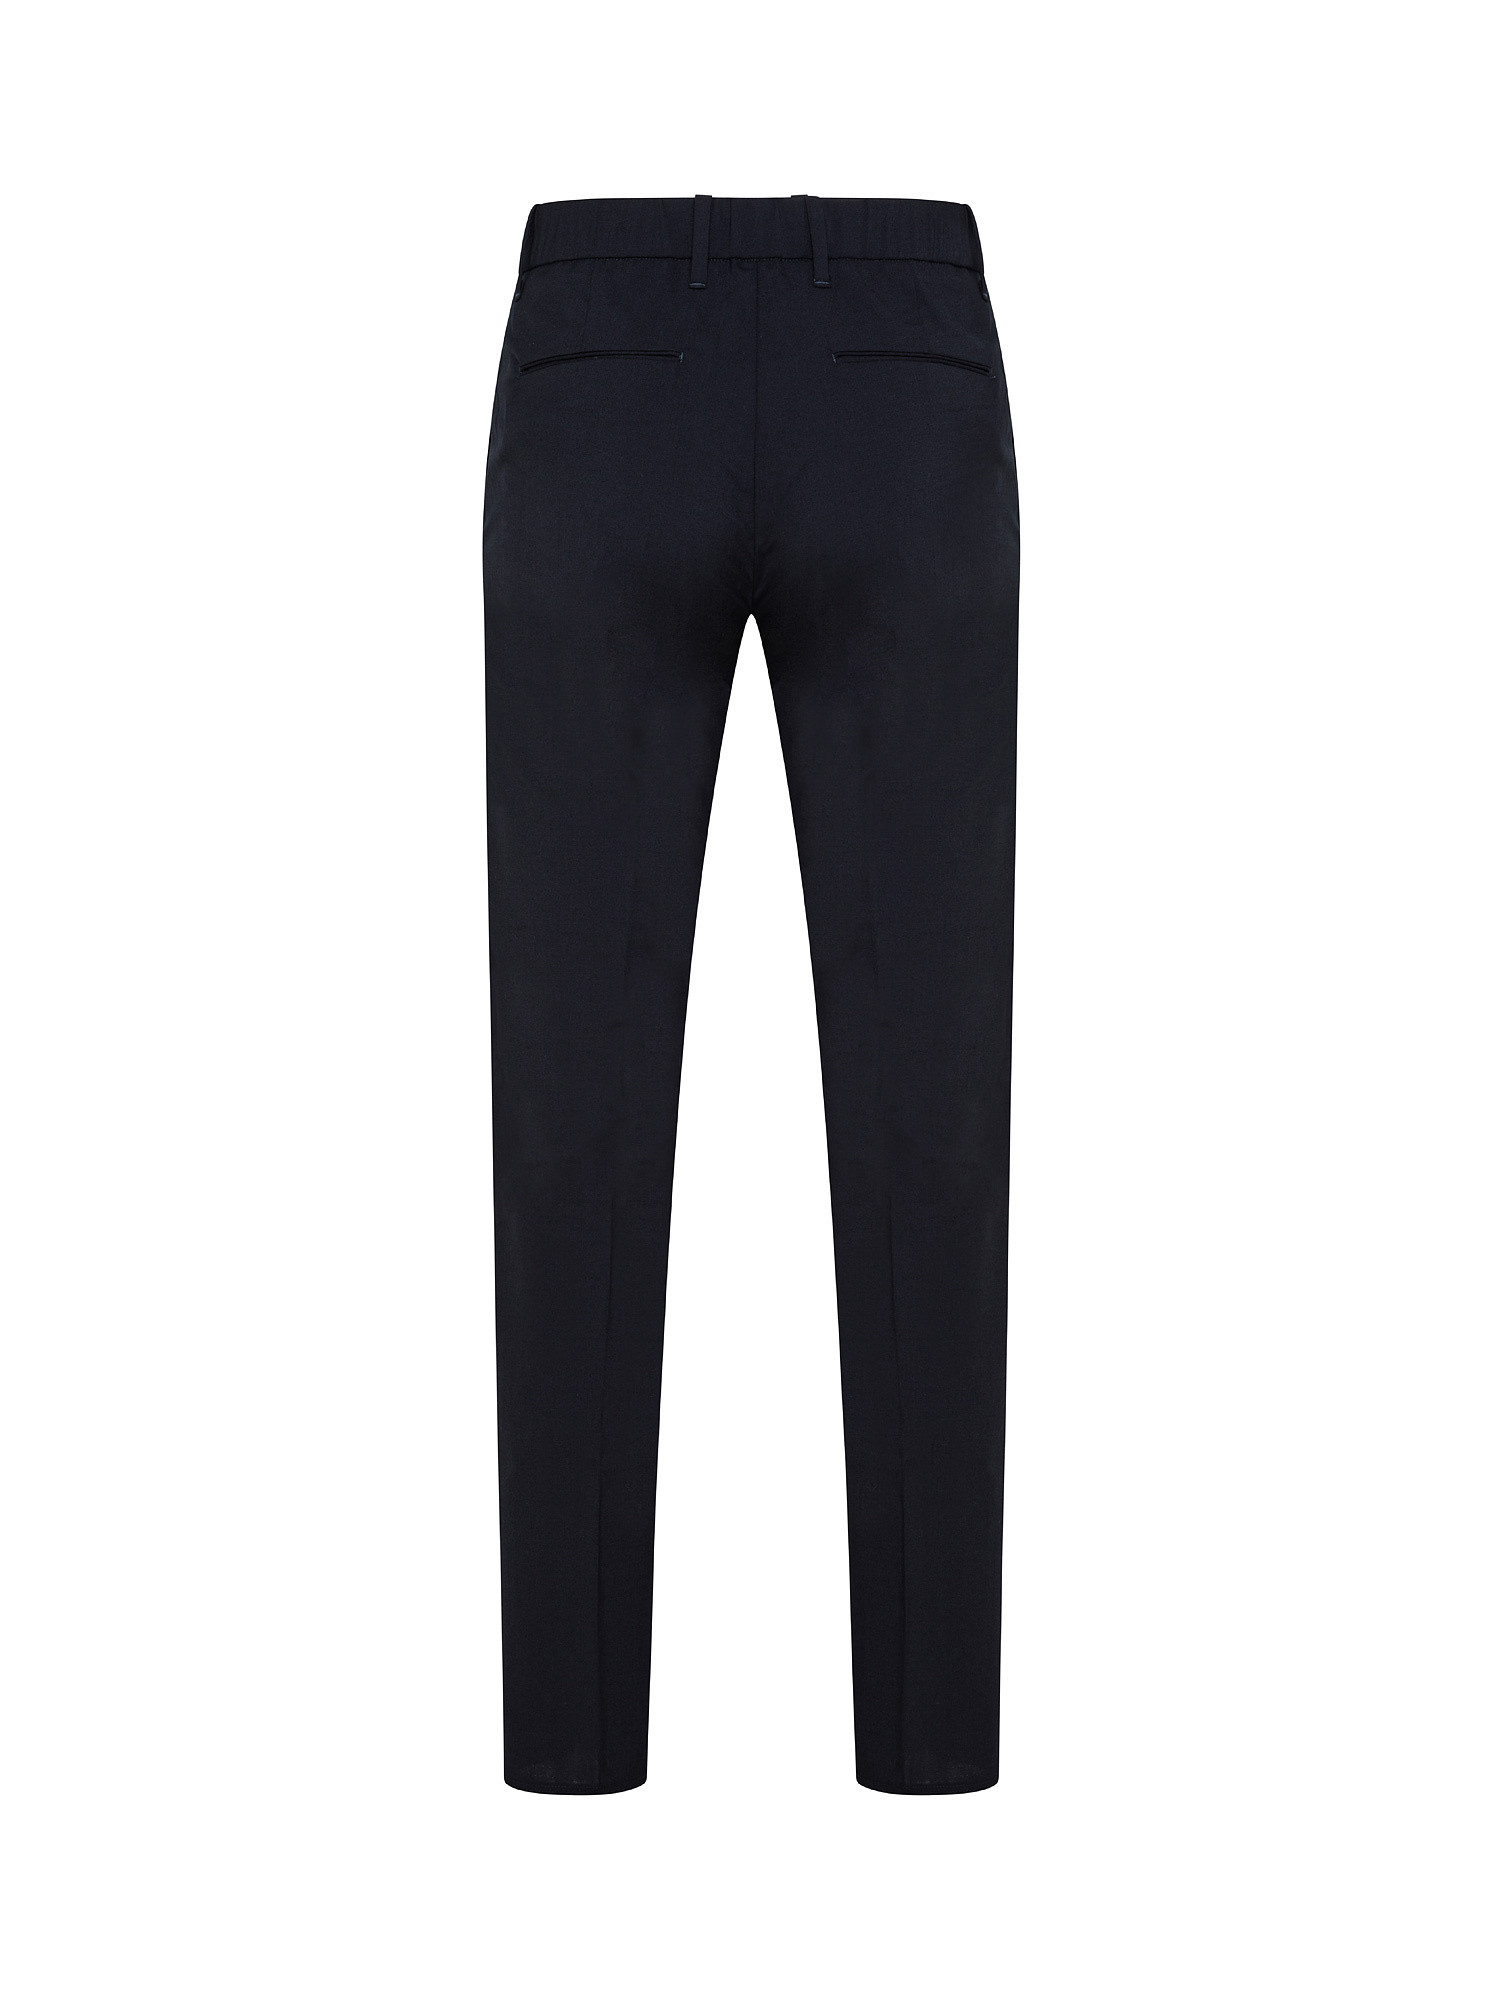 Pantaloni Chino coulisse, Blu scuro, large image number 1